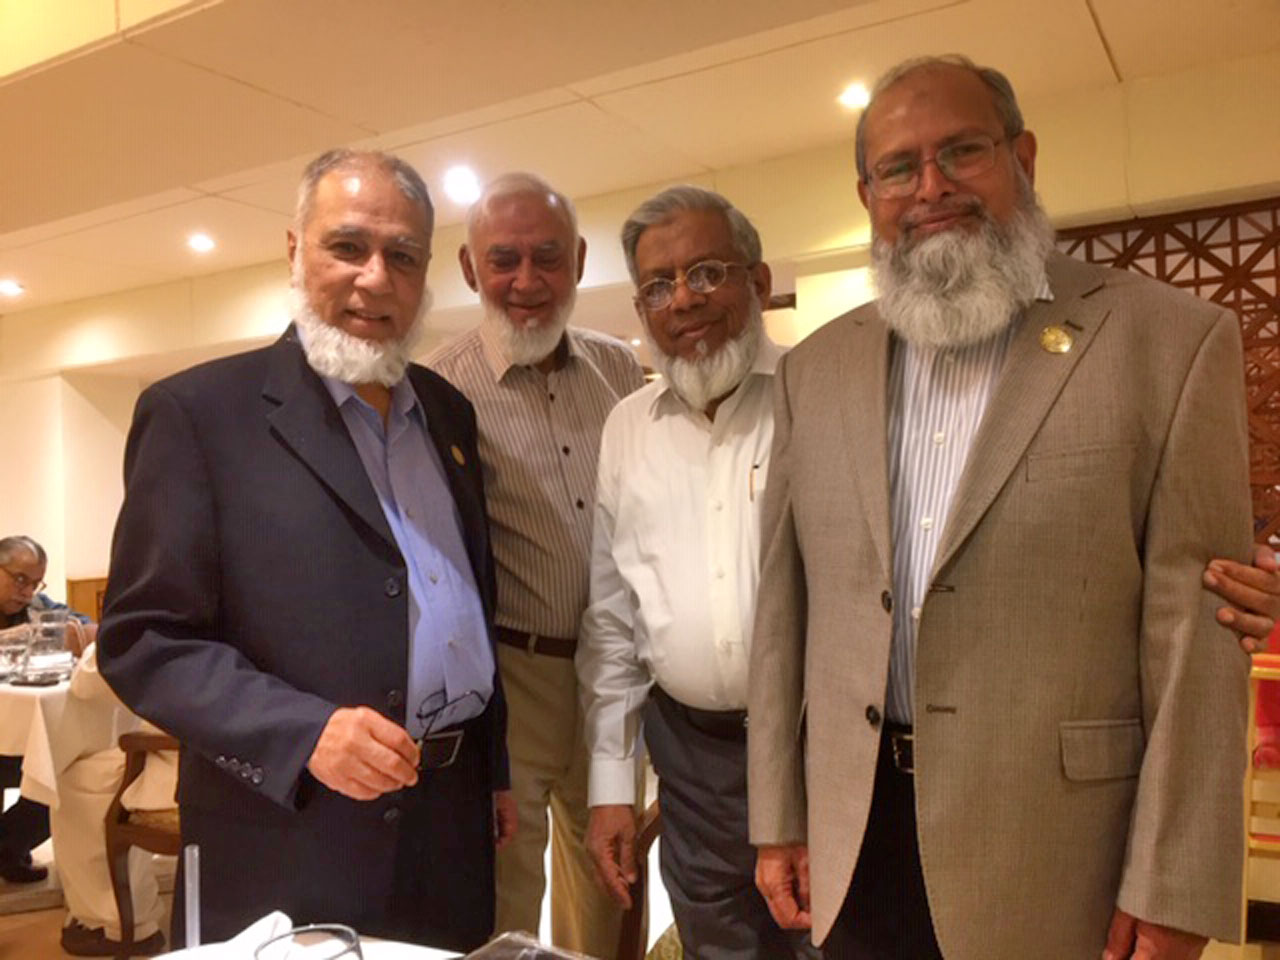 Engr. Khalid Iqbal, Engr. Aqleem Aleem, Engr. Iqbal Ahmed Khan, Engr. Muhammad Hamid